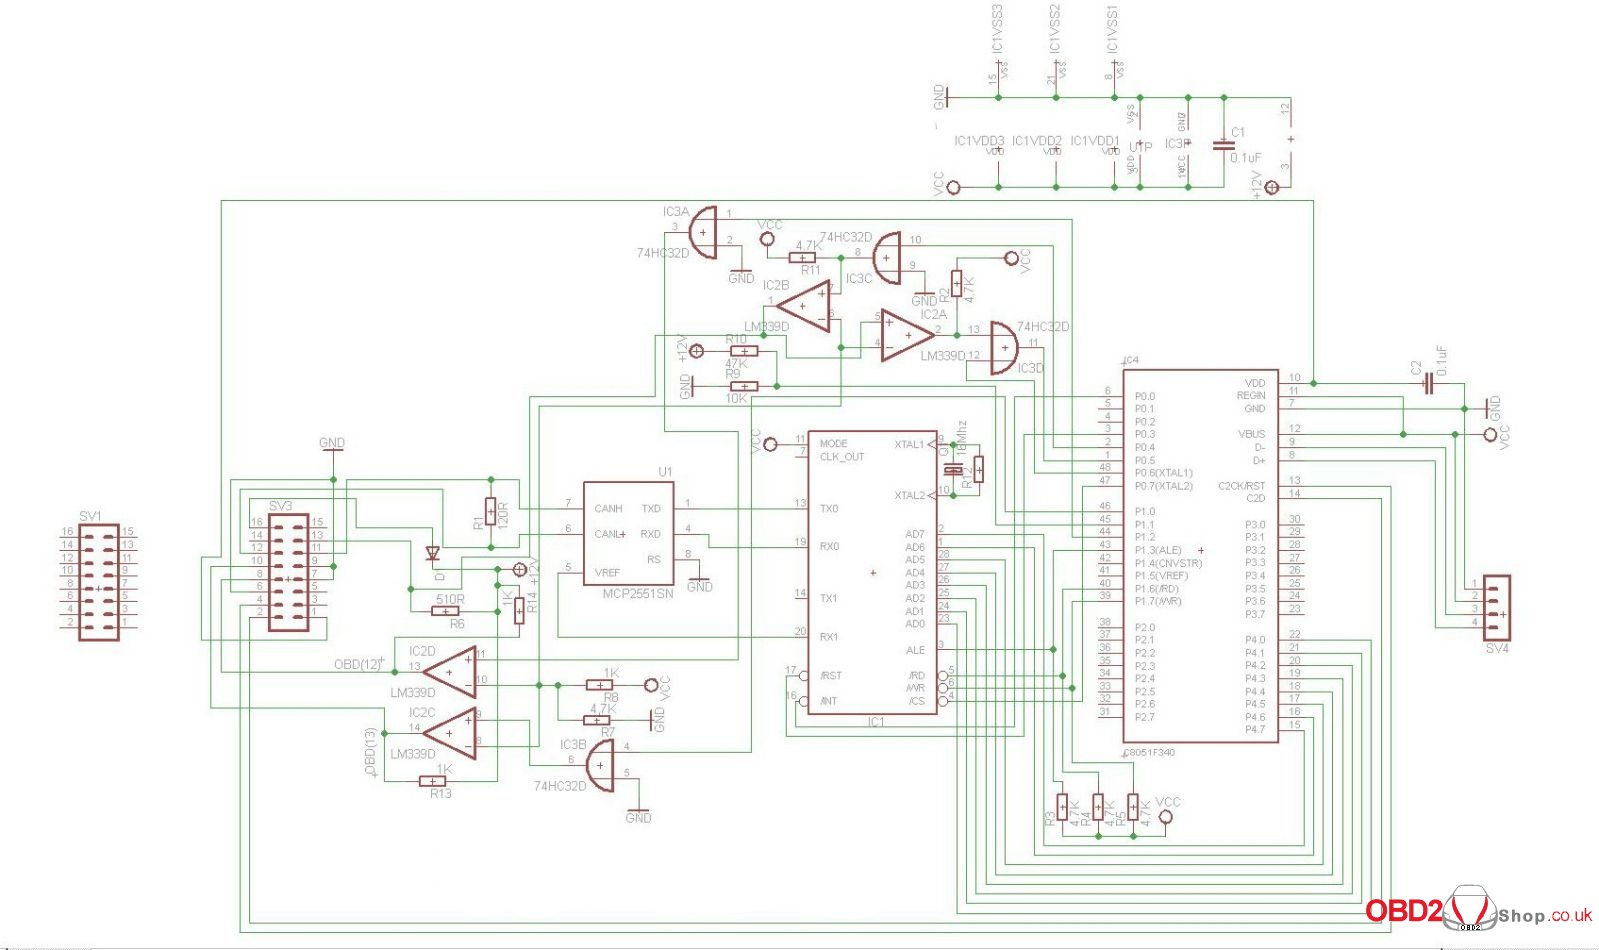 Mpps V18 Pcb Wiring Diagram